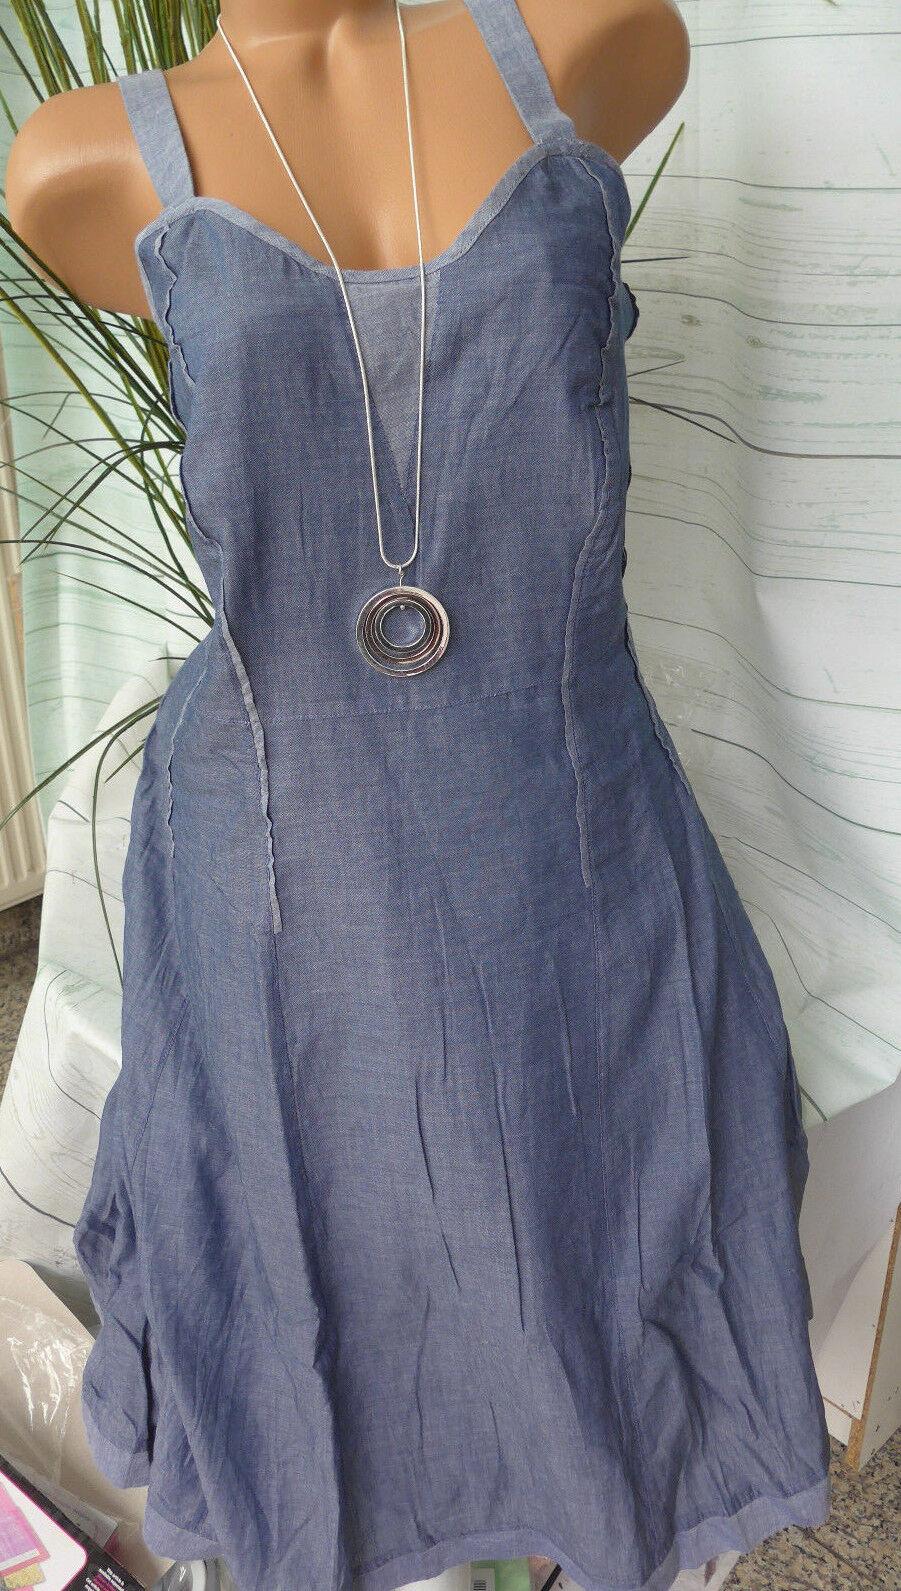 Joe Browns Strap Dress Gr. 40 Bis 58 Denim Dress Look New (568)